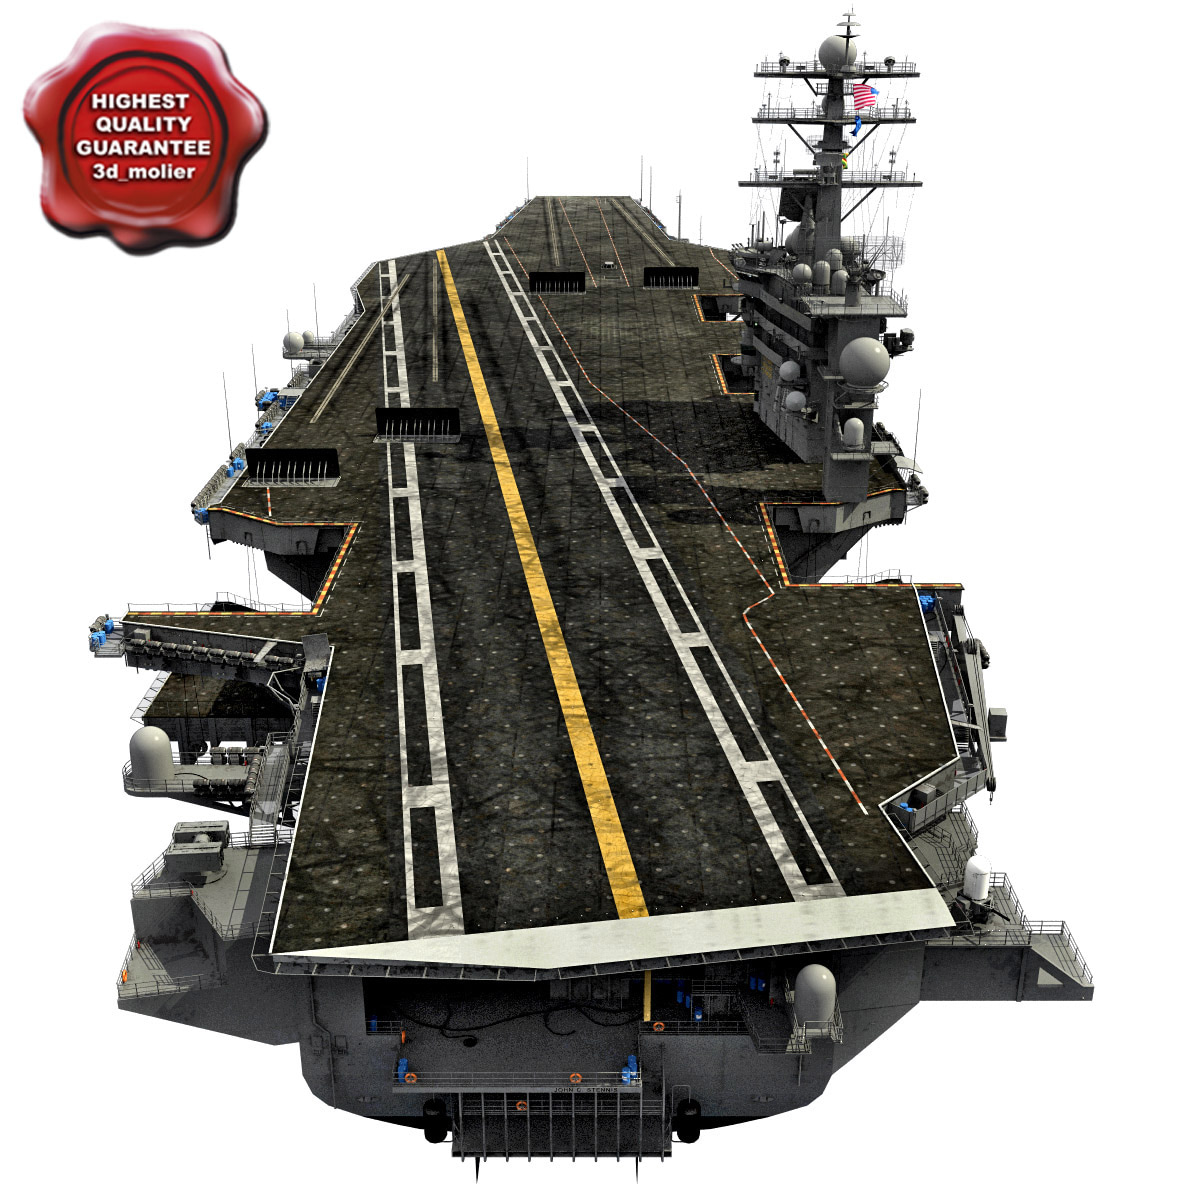 USS_John_C_Stennis_CVN-74_00.jpg